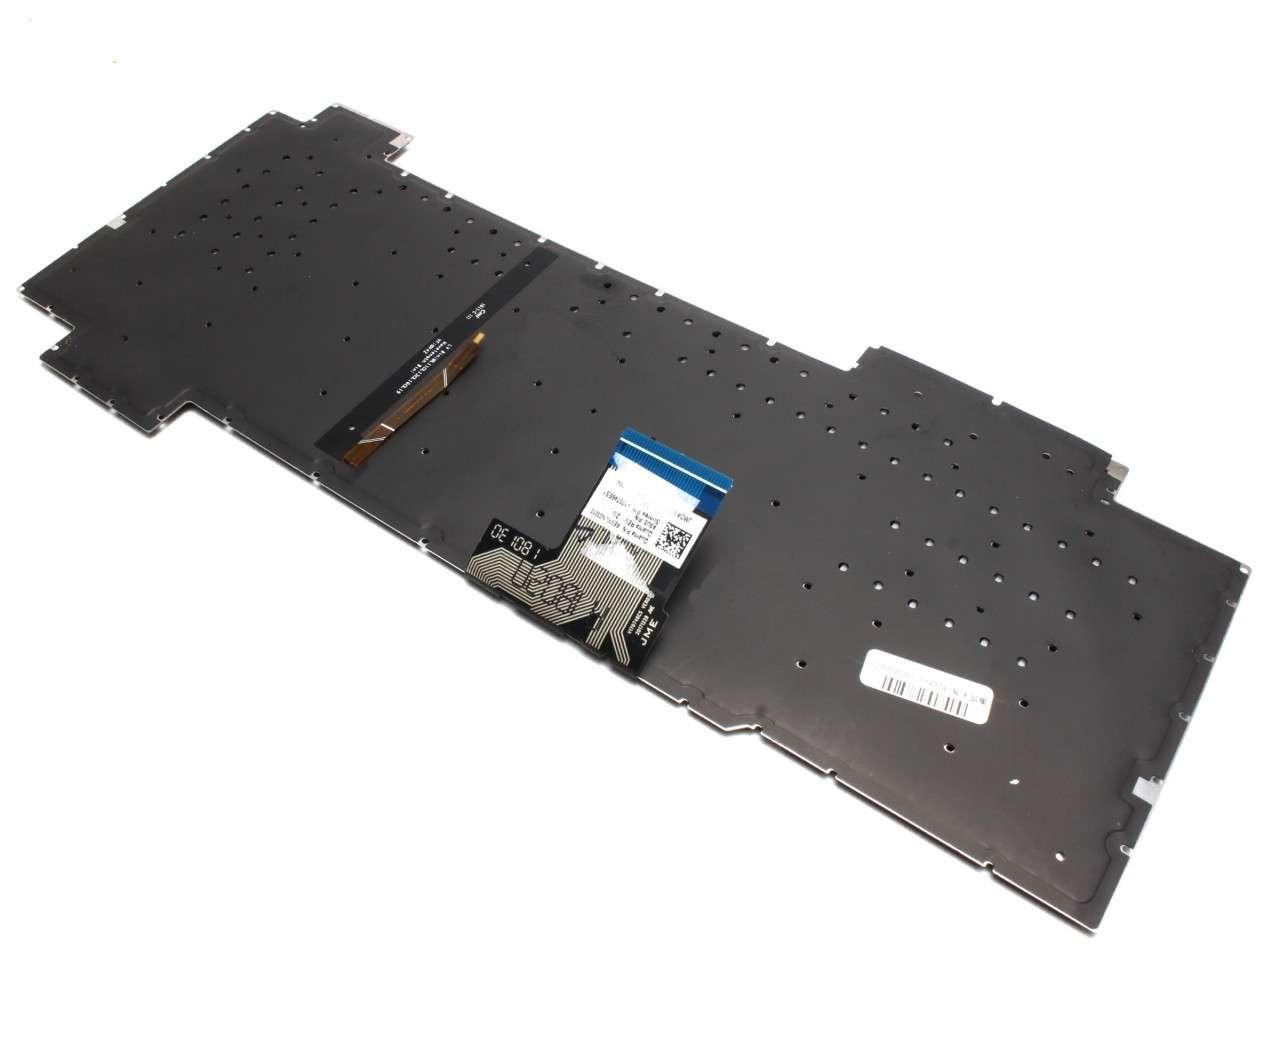 Tastatura neagra cu iluminare rosie pe marginea tastelor Asus TUF Gaming FX504GE-ES72 iluminata layout US fara rama enter mic imagine powerlaptop.ro 2021